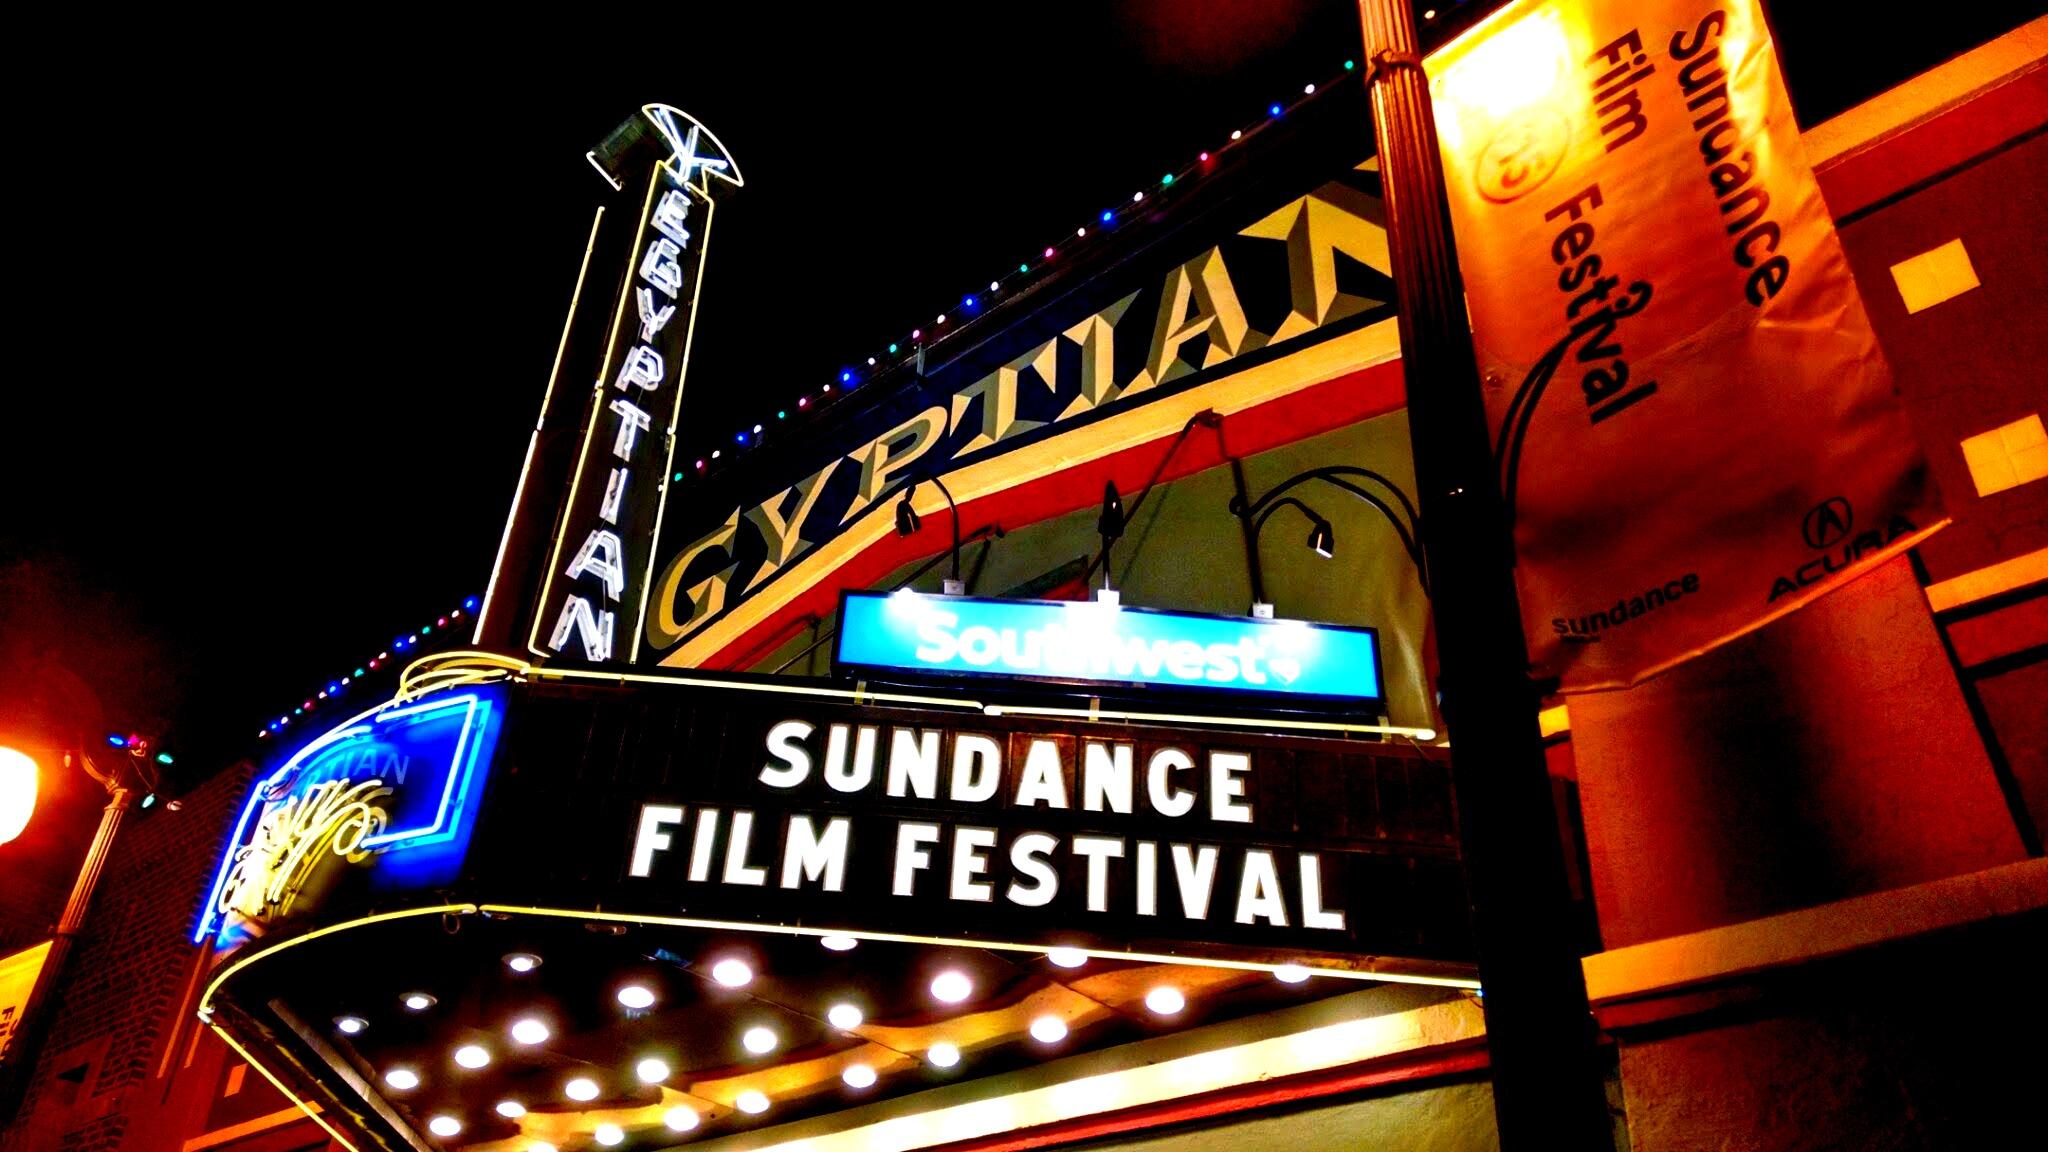 Sundance Film Festival - Wikipedia